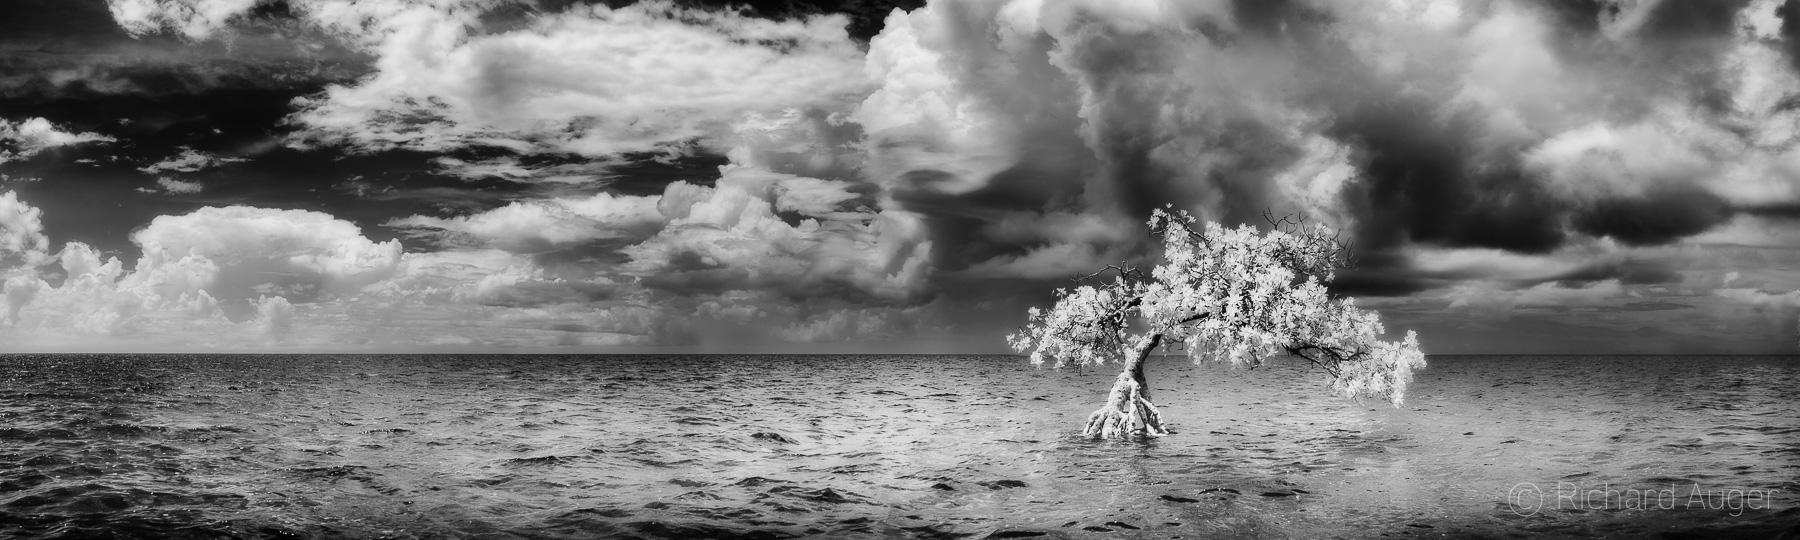 Long Mangrove State Park, Florida Keys, Storm, Moody, Sepia, Monochrome, light, photograph, photographer, water, landscape, black and white, panorama